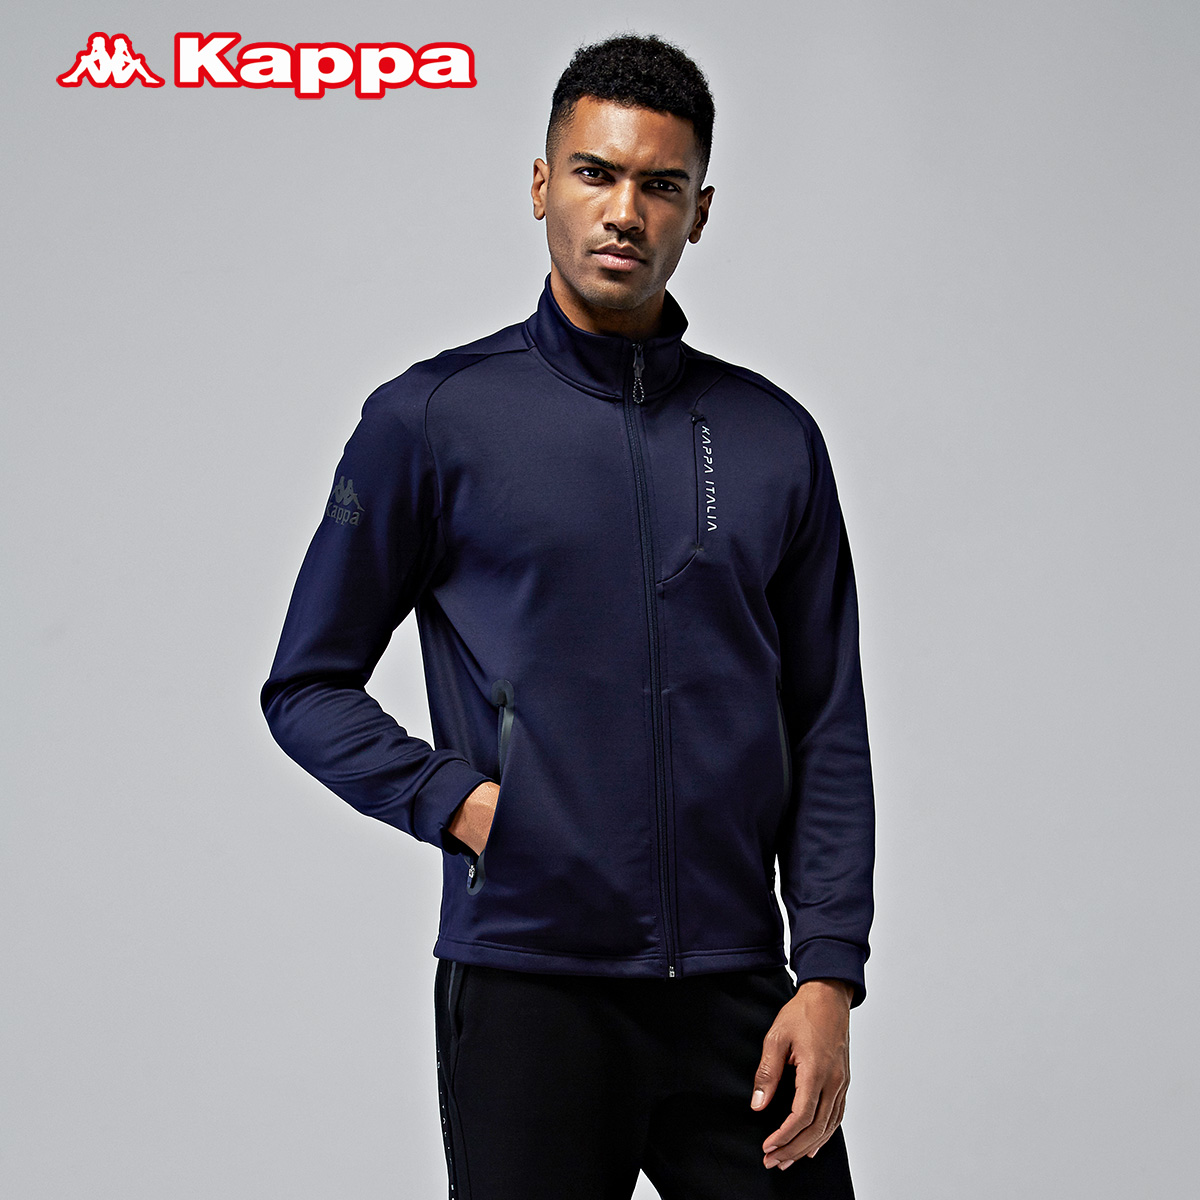 Kappa卡帕男款运动卫衣休闲 男外套上衣运动服 |K0752WK49